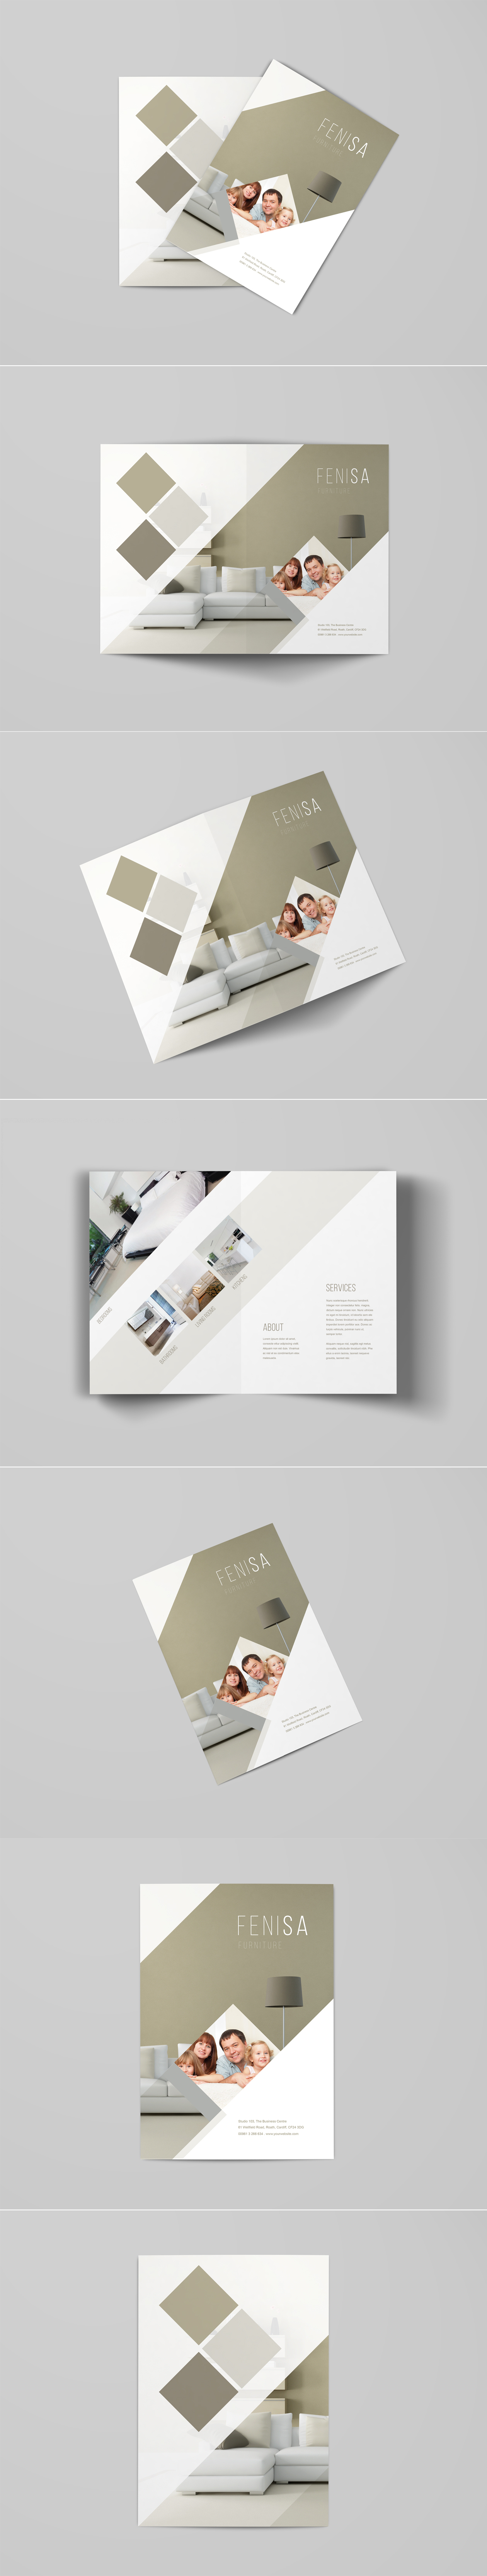 A4 Bi-Fold Brochure PSD